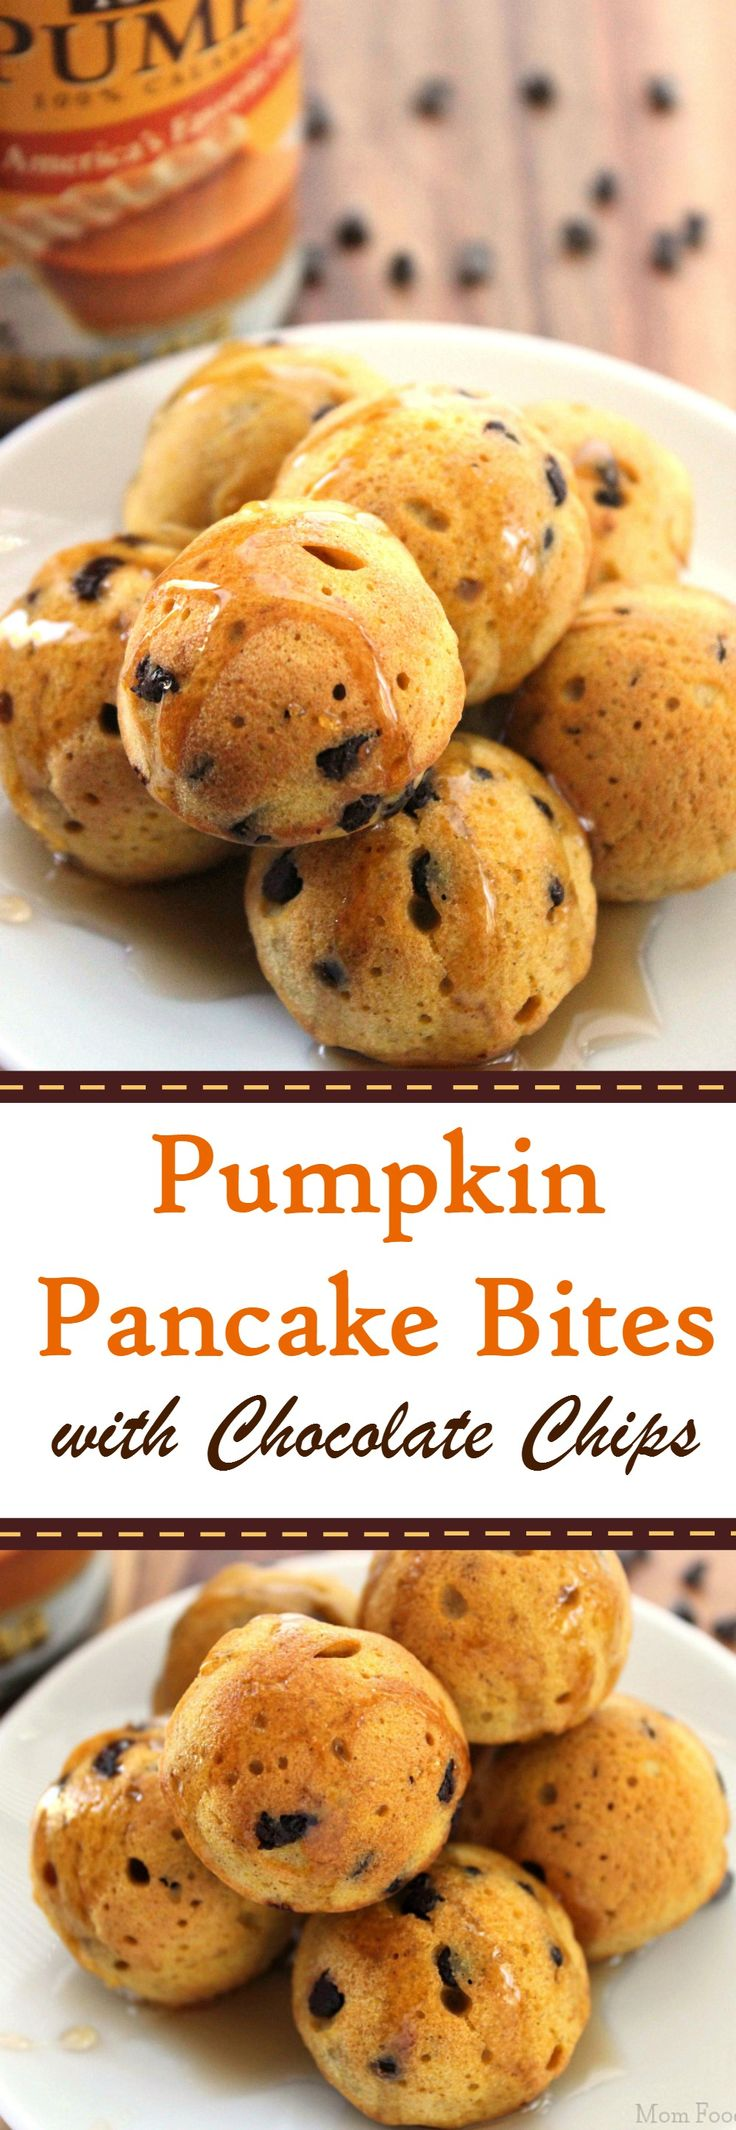 Pumpkin Pancake Bites with Chocolate Chips